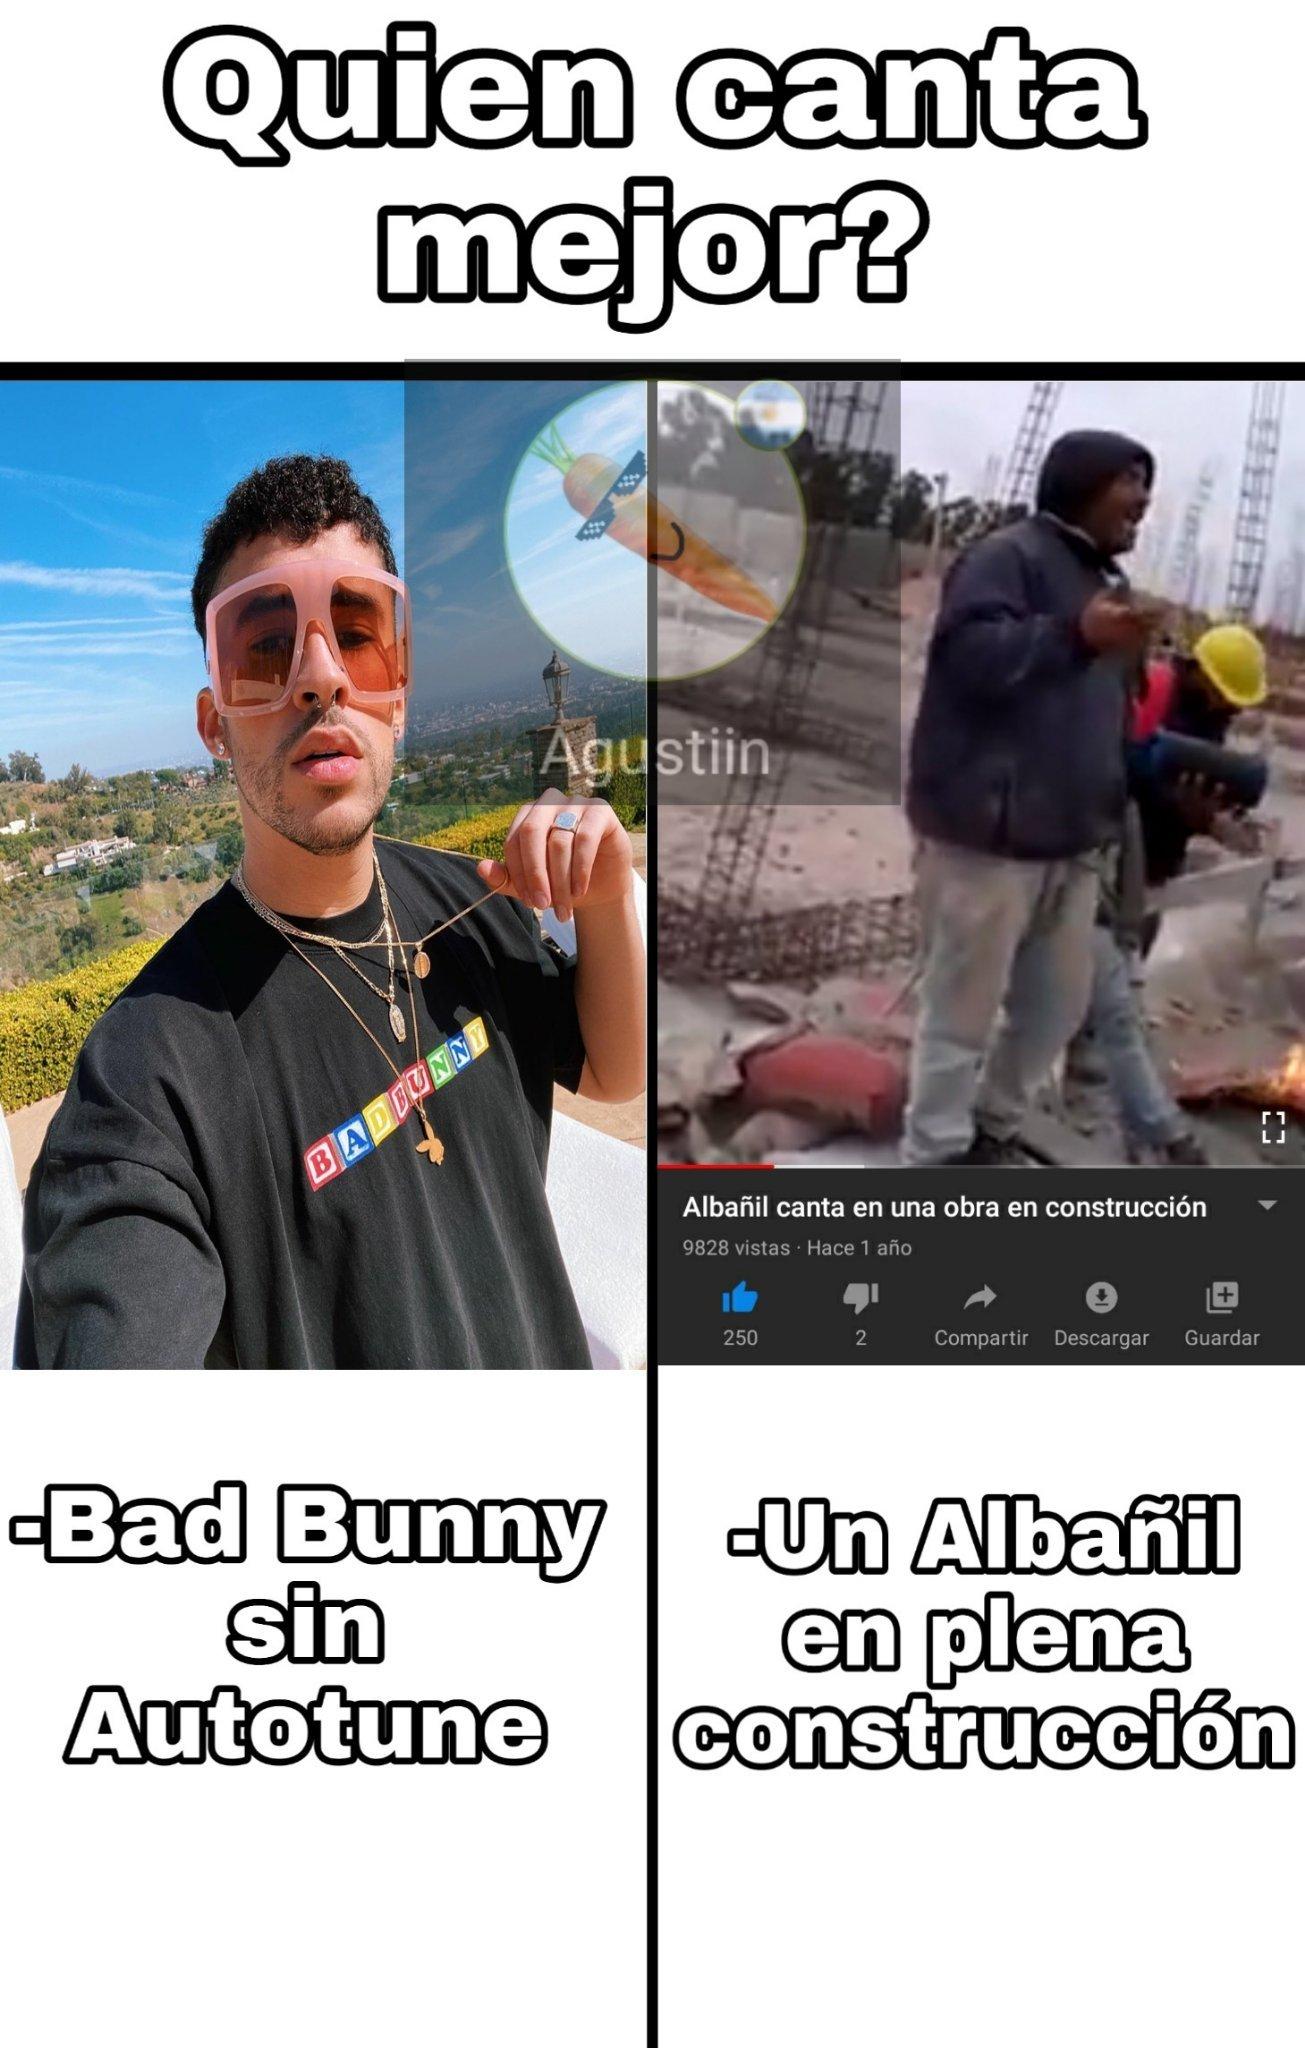 Un capo el albañil - meme